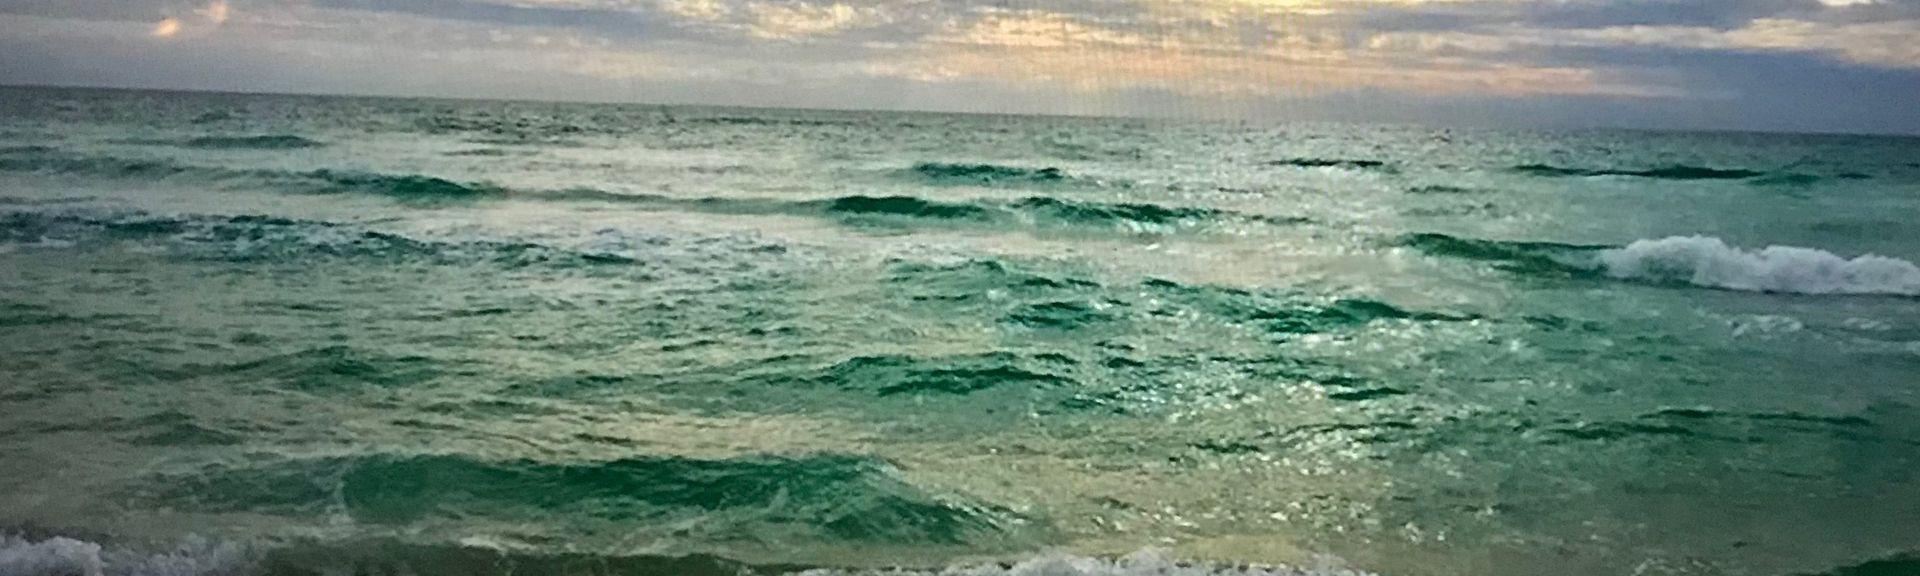 Tropic Winds, Panama City Beach, FL, USA